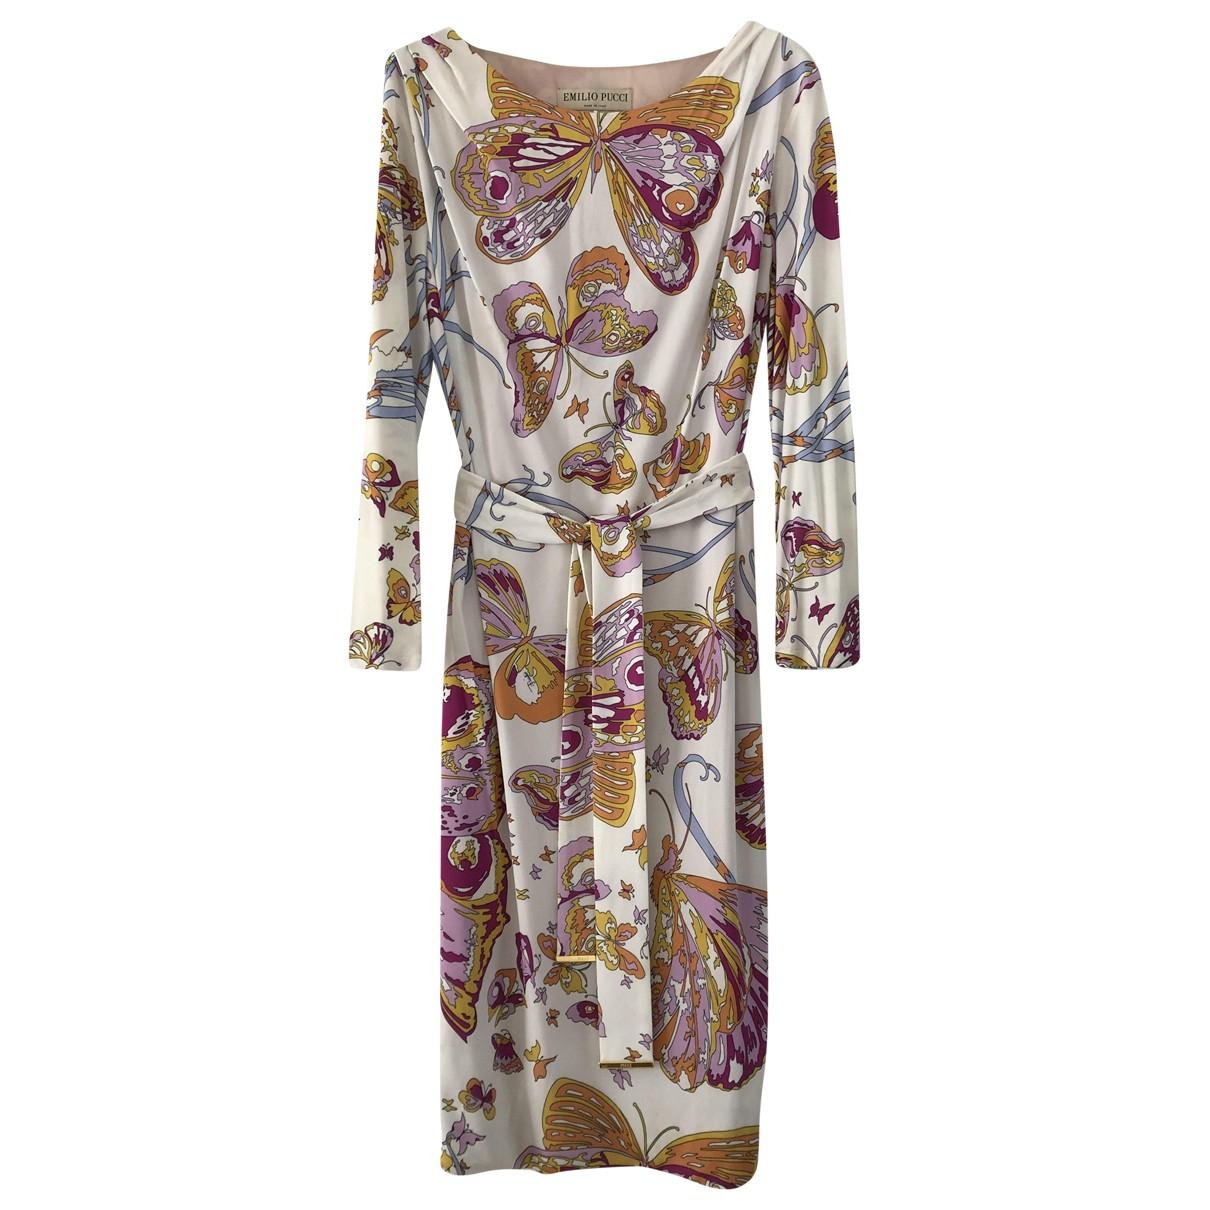 Emilio Pucci N Multicolour dress for Women M International